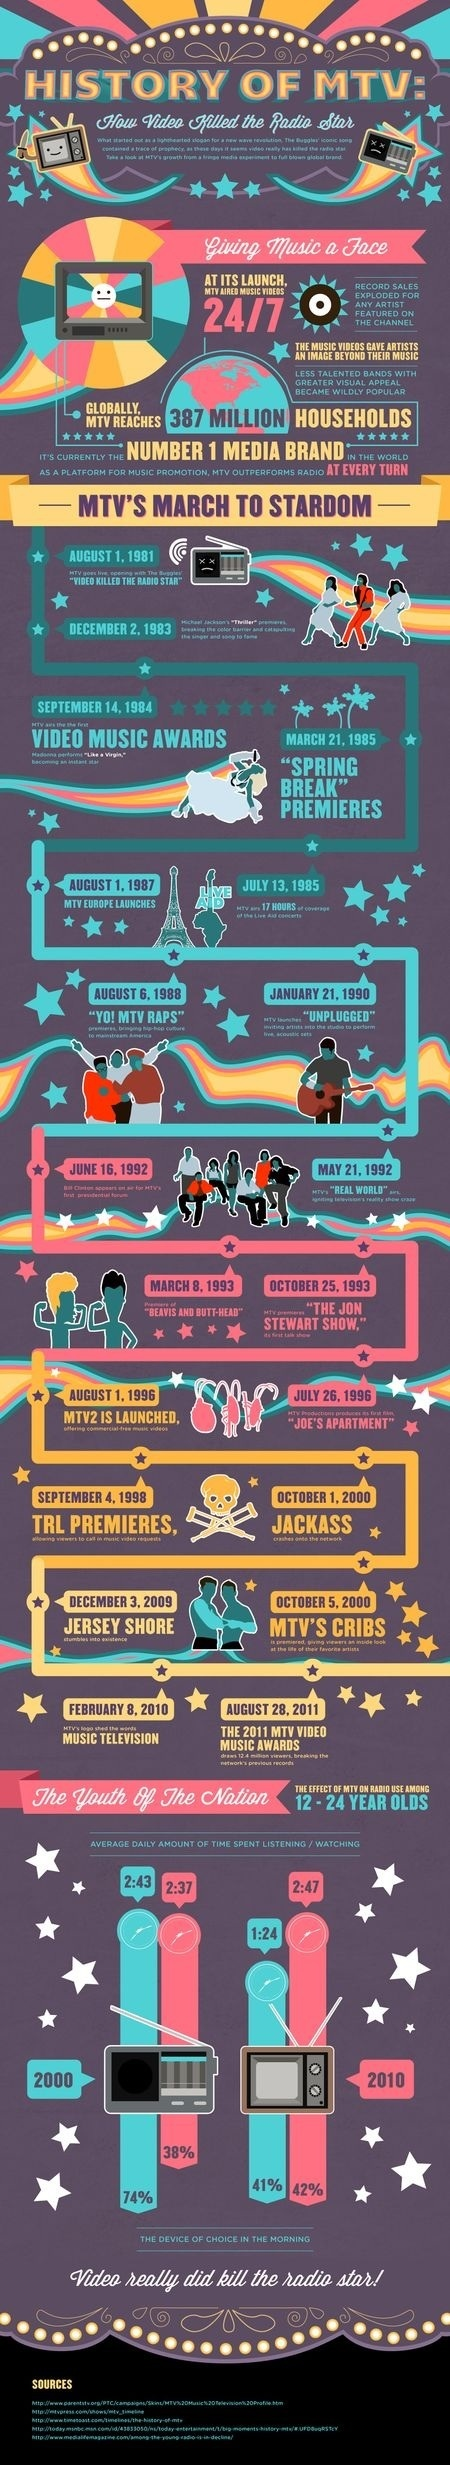 L'histoire de MTV en infographie   Radio 2.0 (En & Fr)   Scoop.it